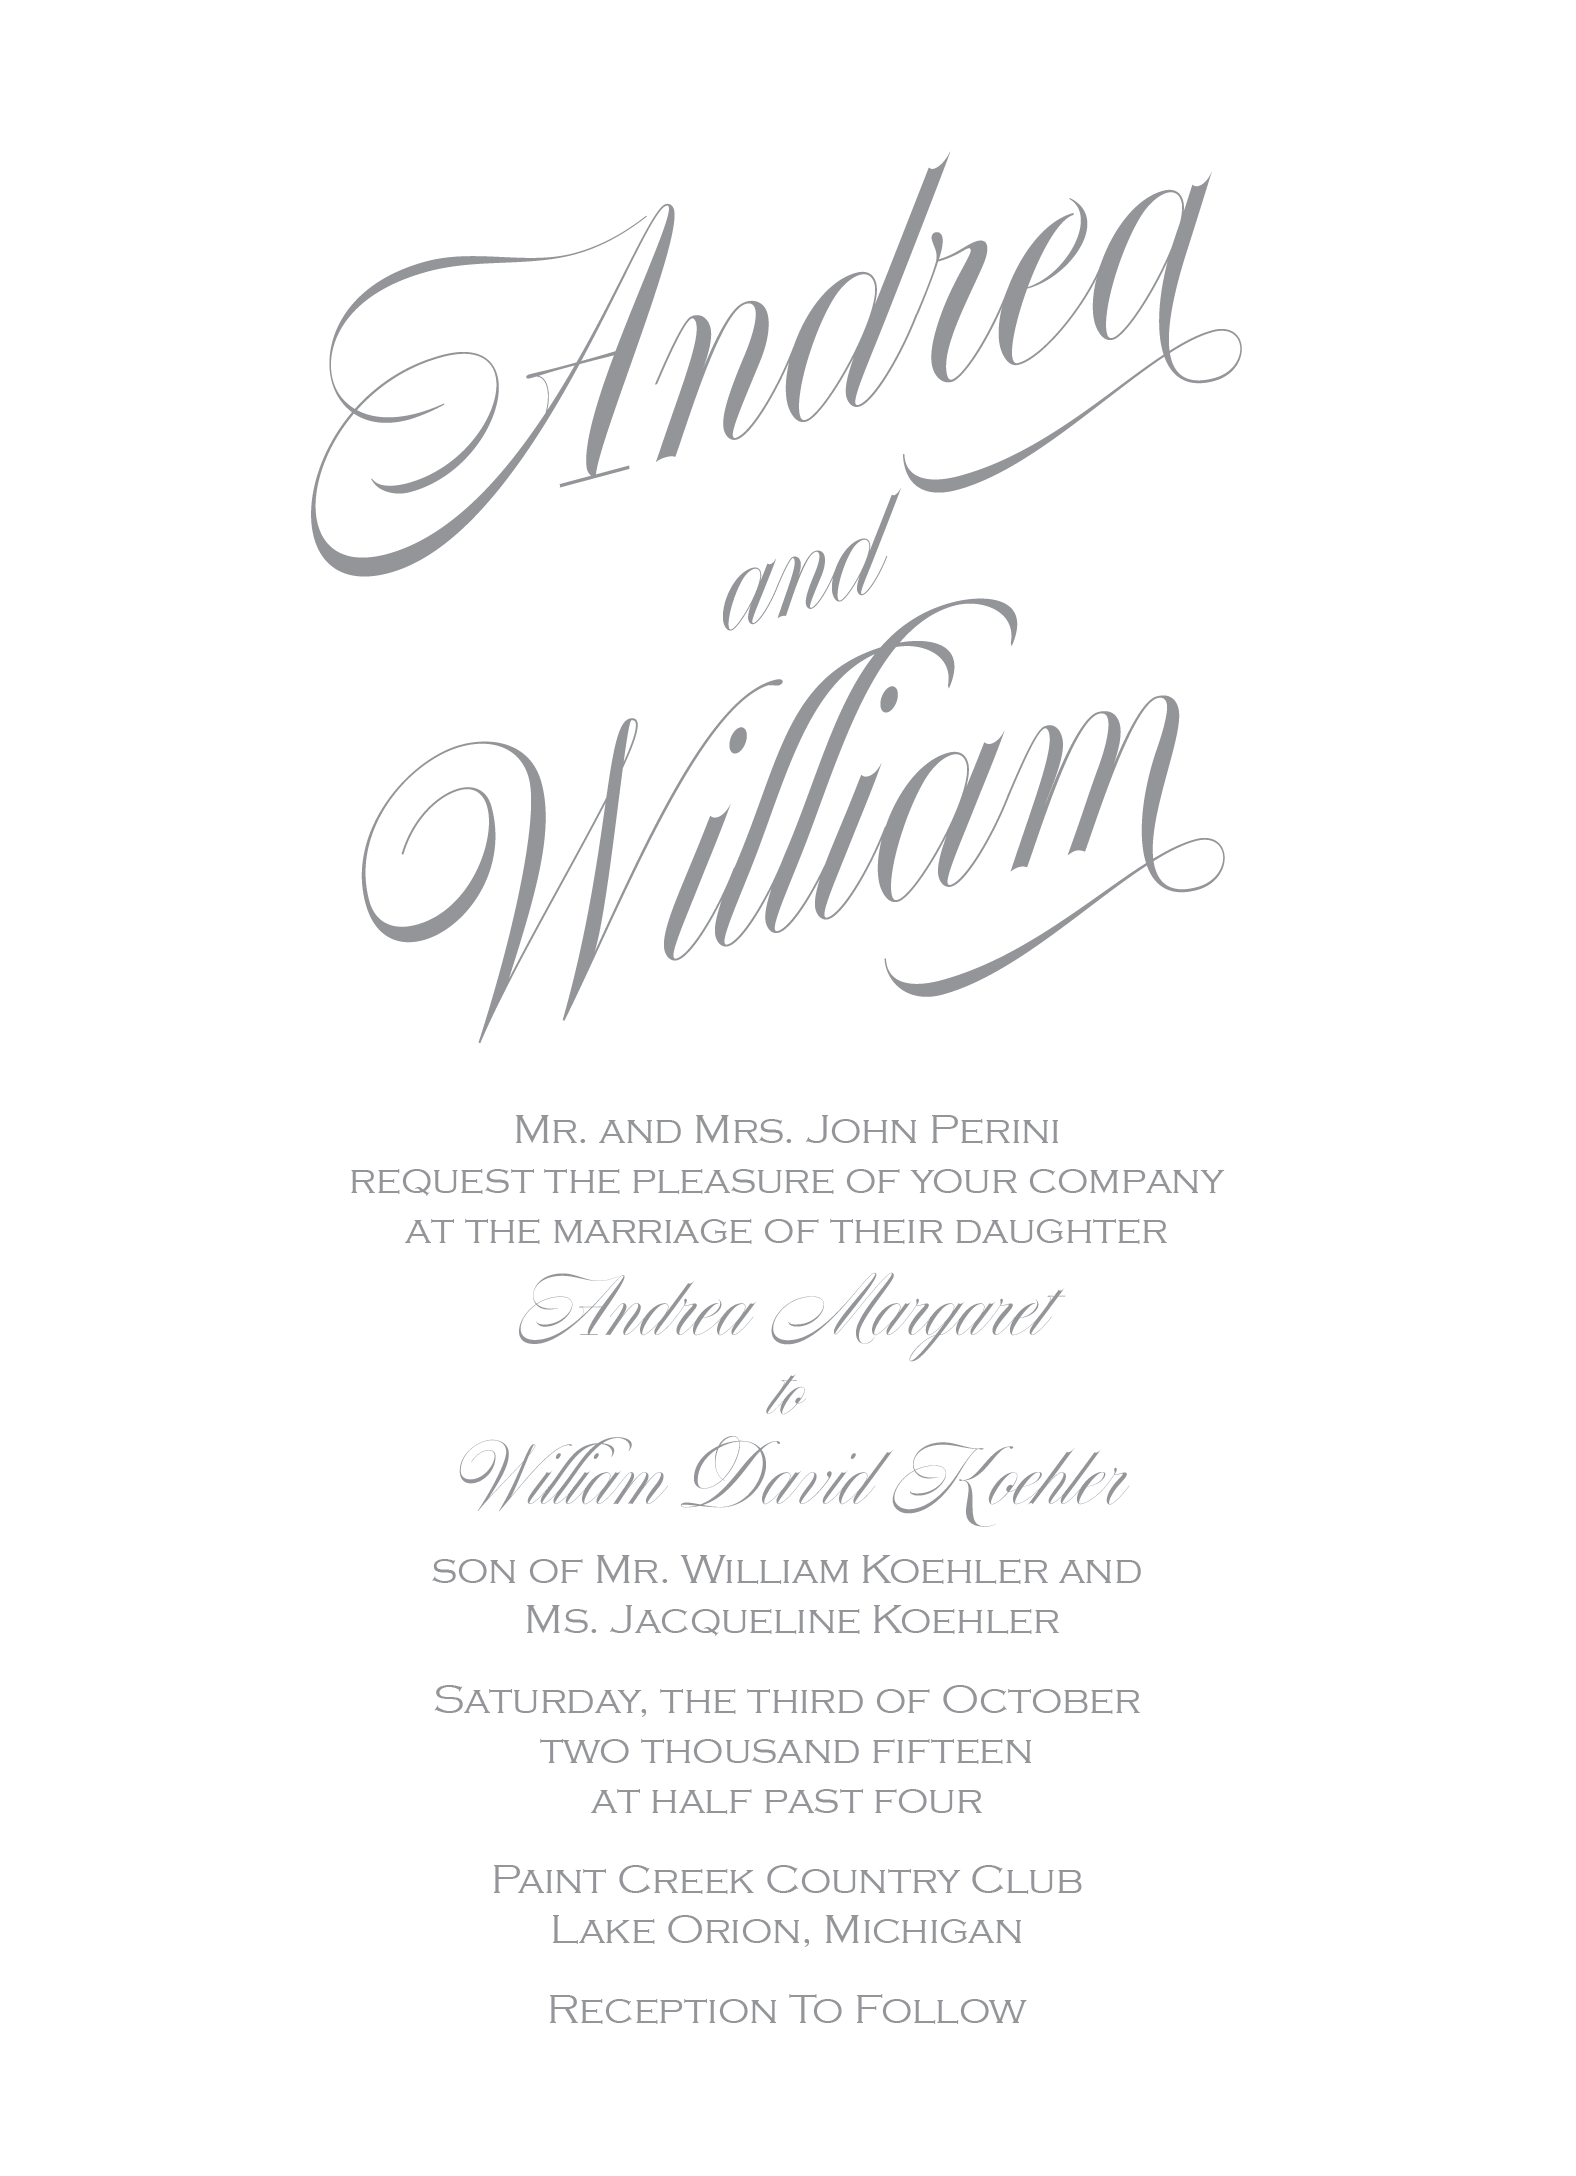 Lace Wedding Suite_Andrea_Invitation.png